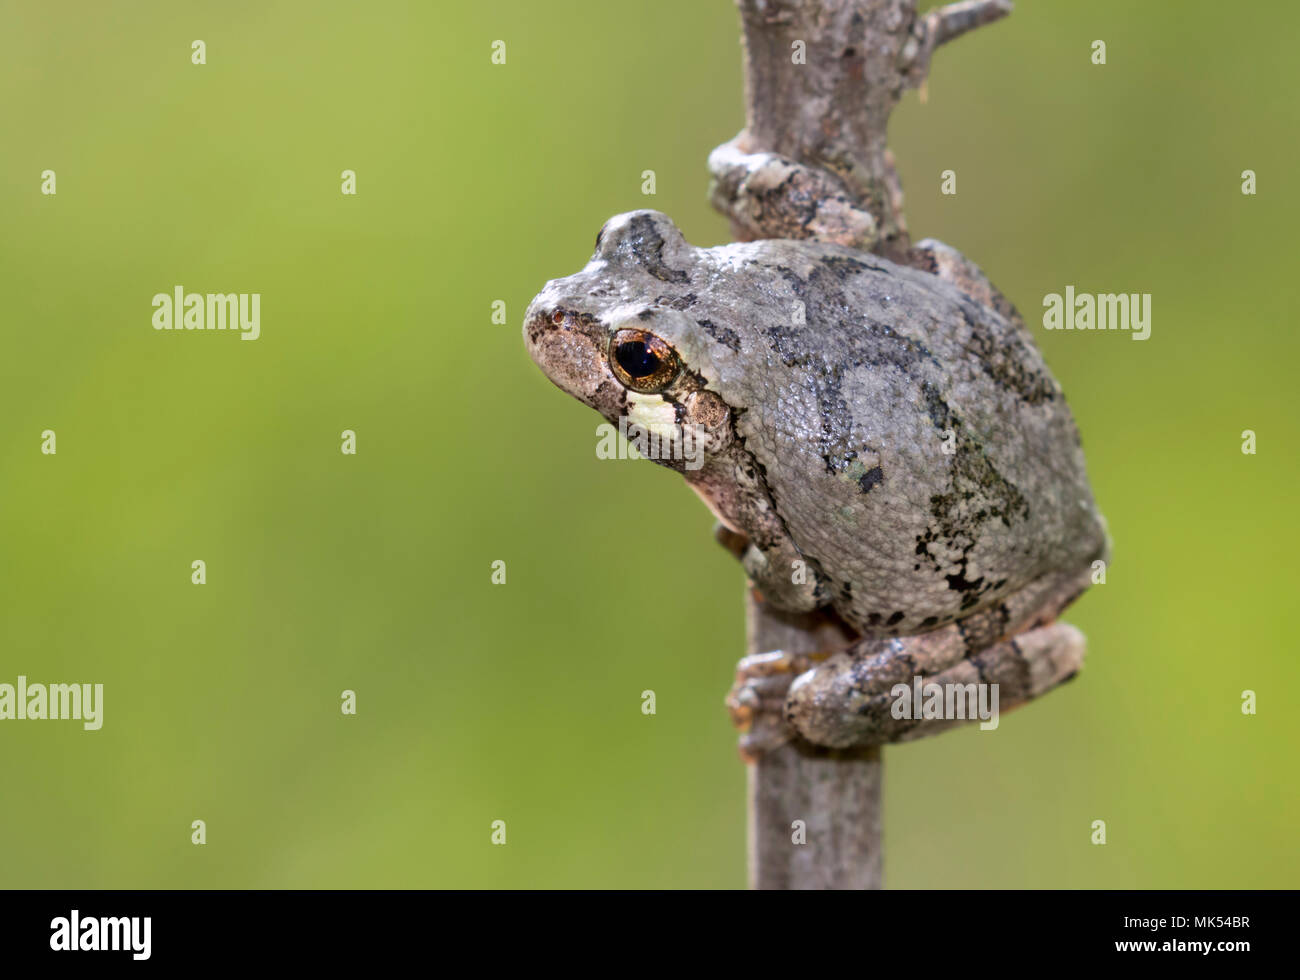 Gray treefrog (Hyla versicolor) on a tree branch, Iowa, USA. - Stock Image